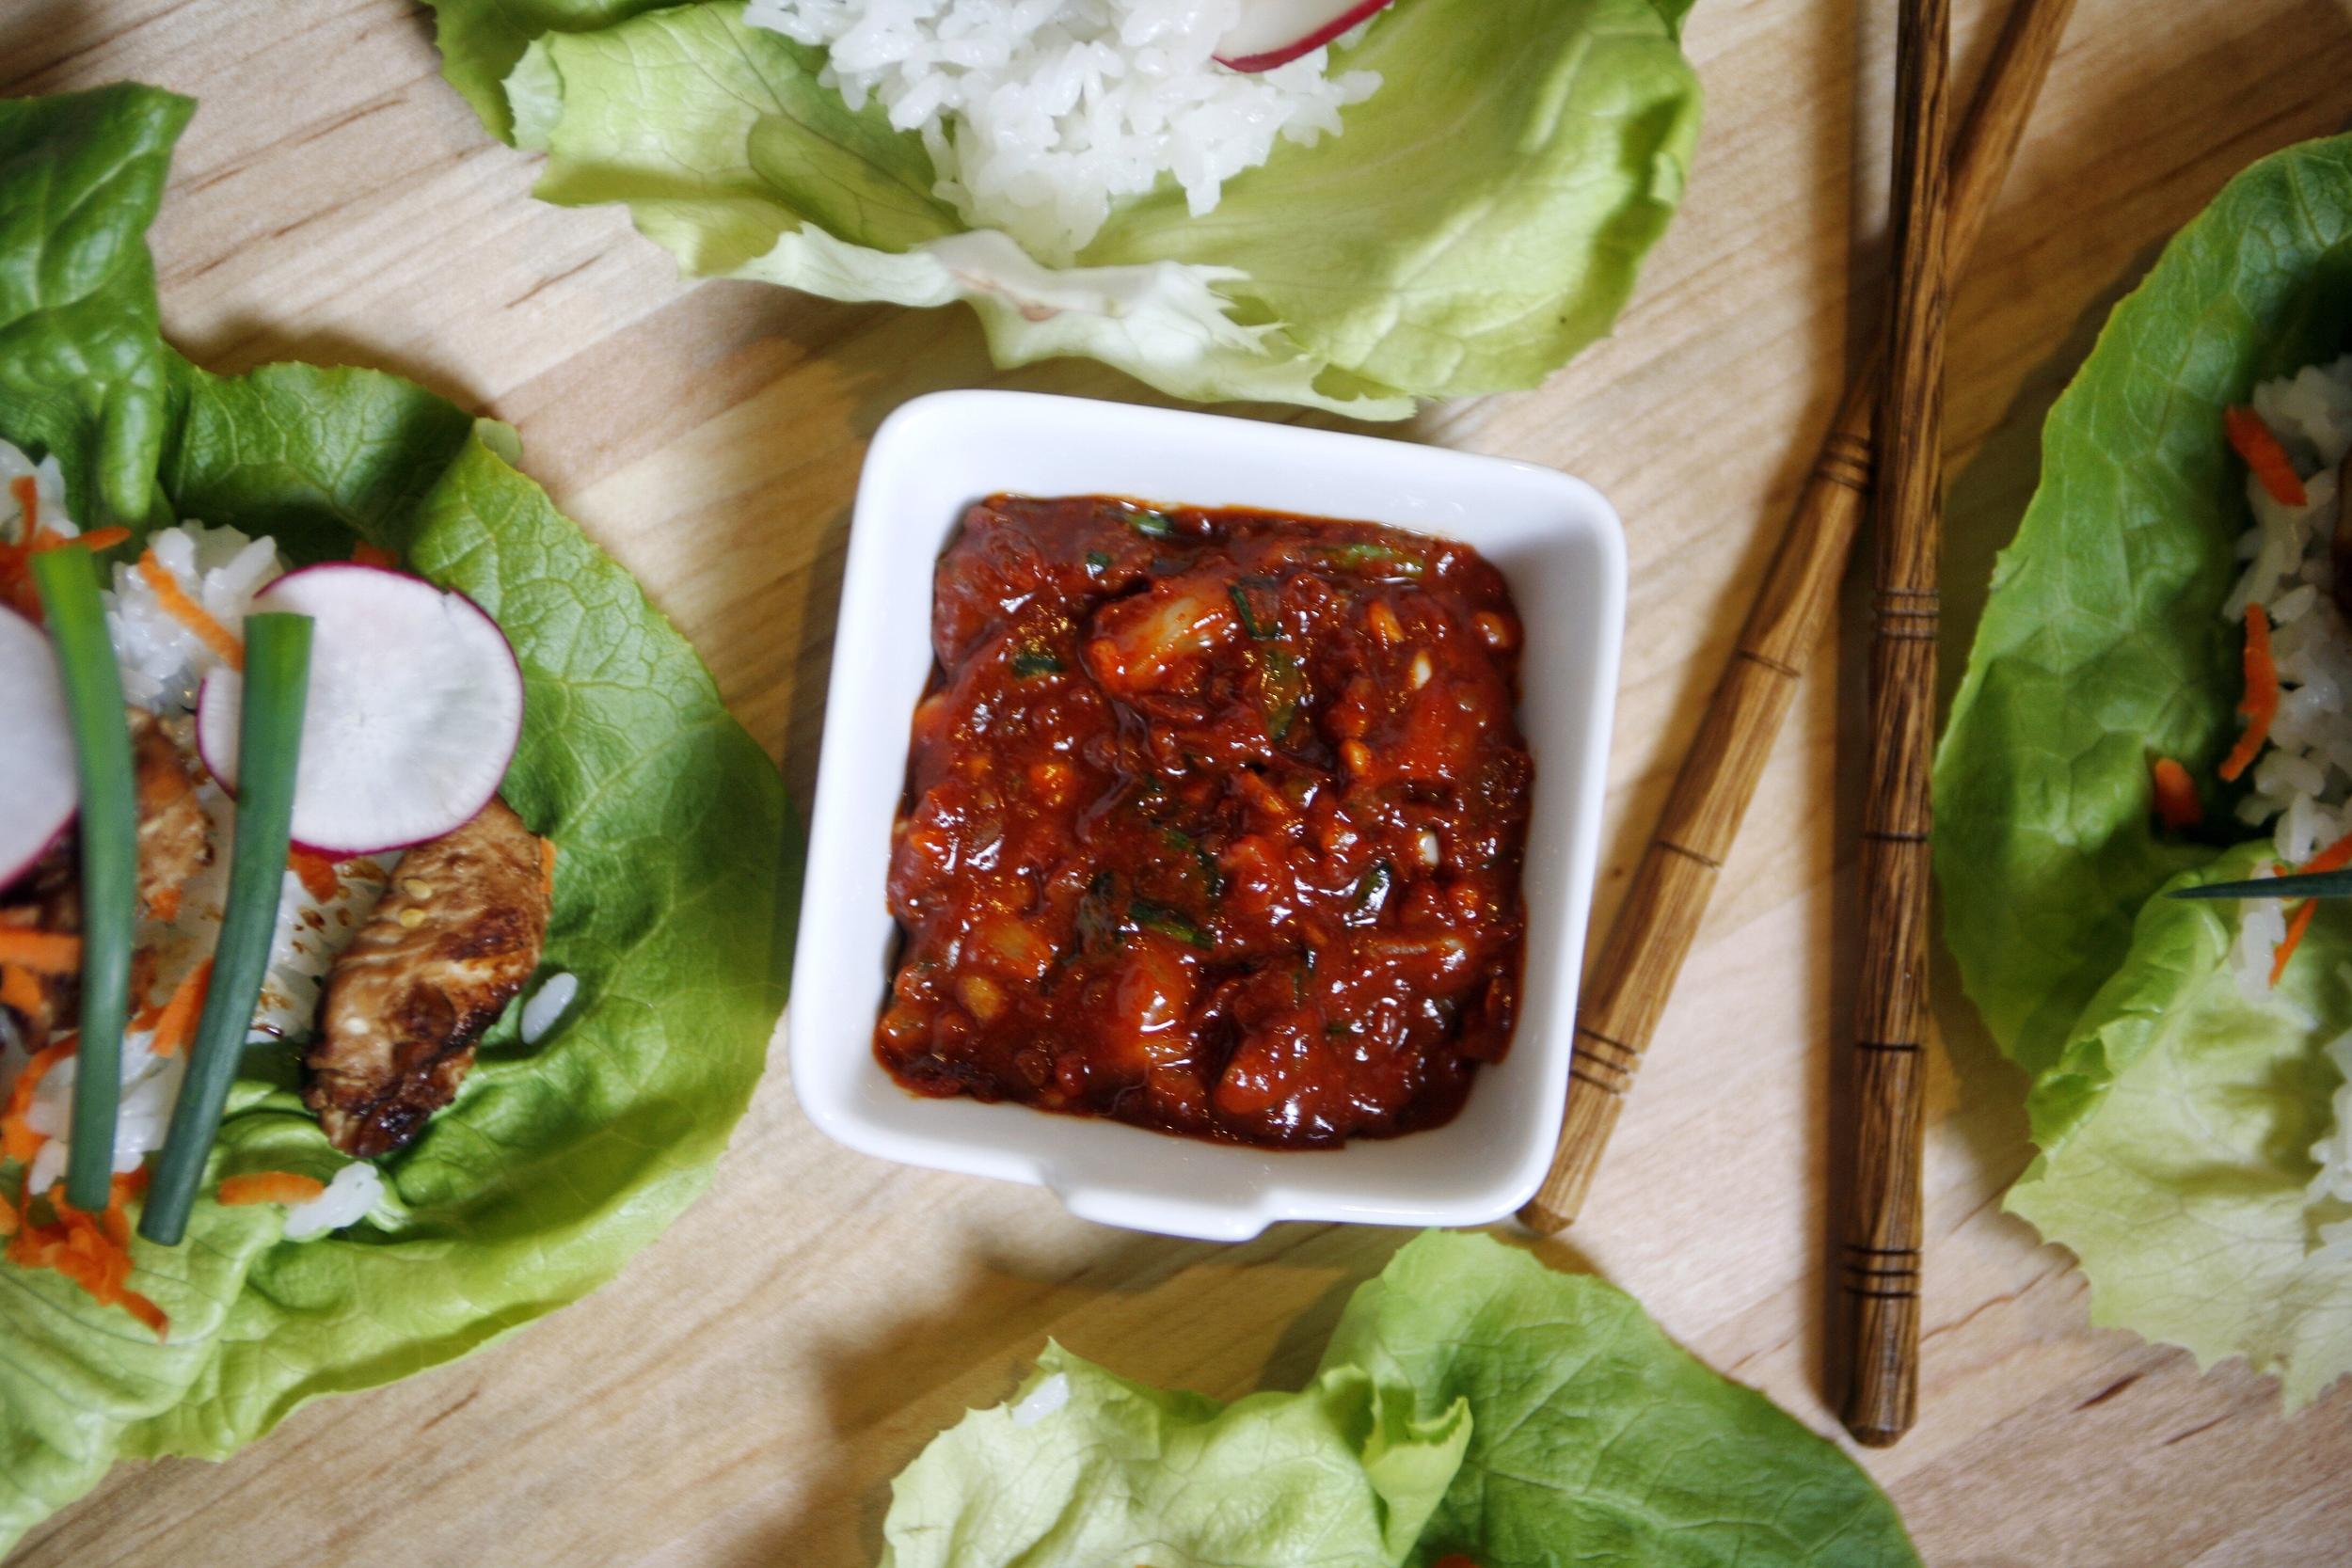 Ssamjang sauce (쌈장).